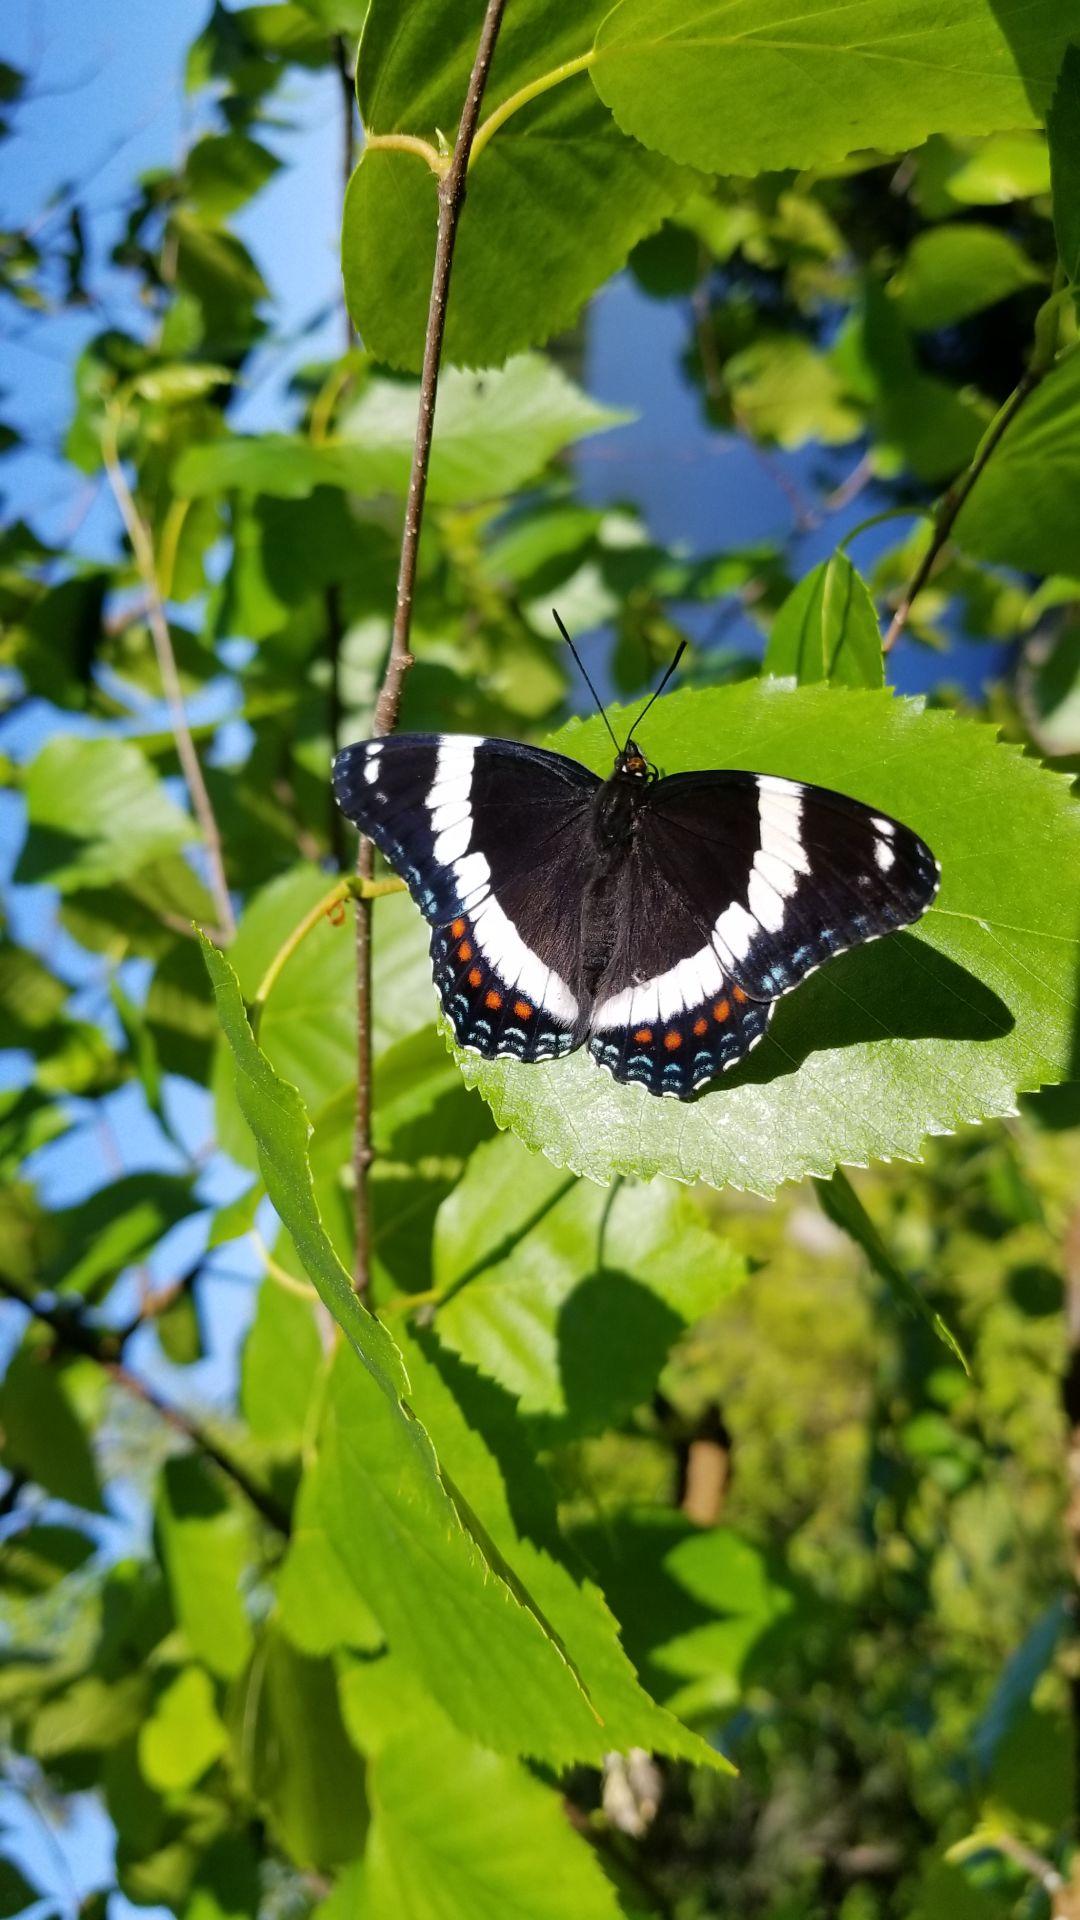 Mackenthun butterfly foto 5-31